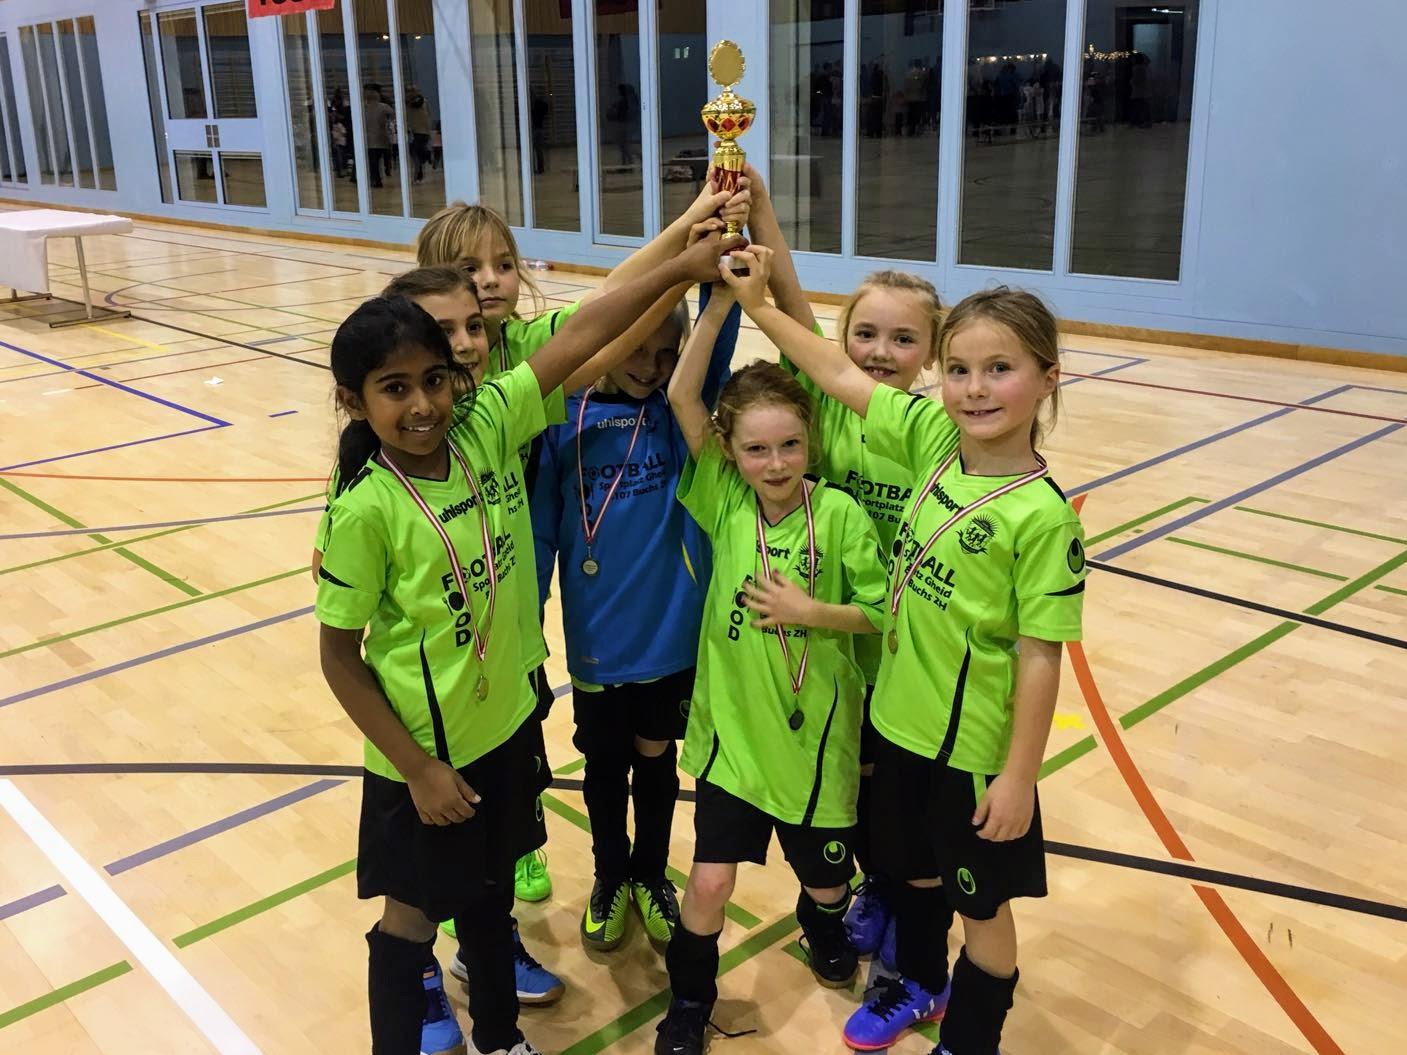 Girls Soccer School: Turnier in Embrach